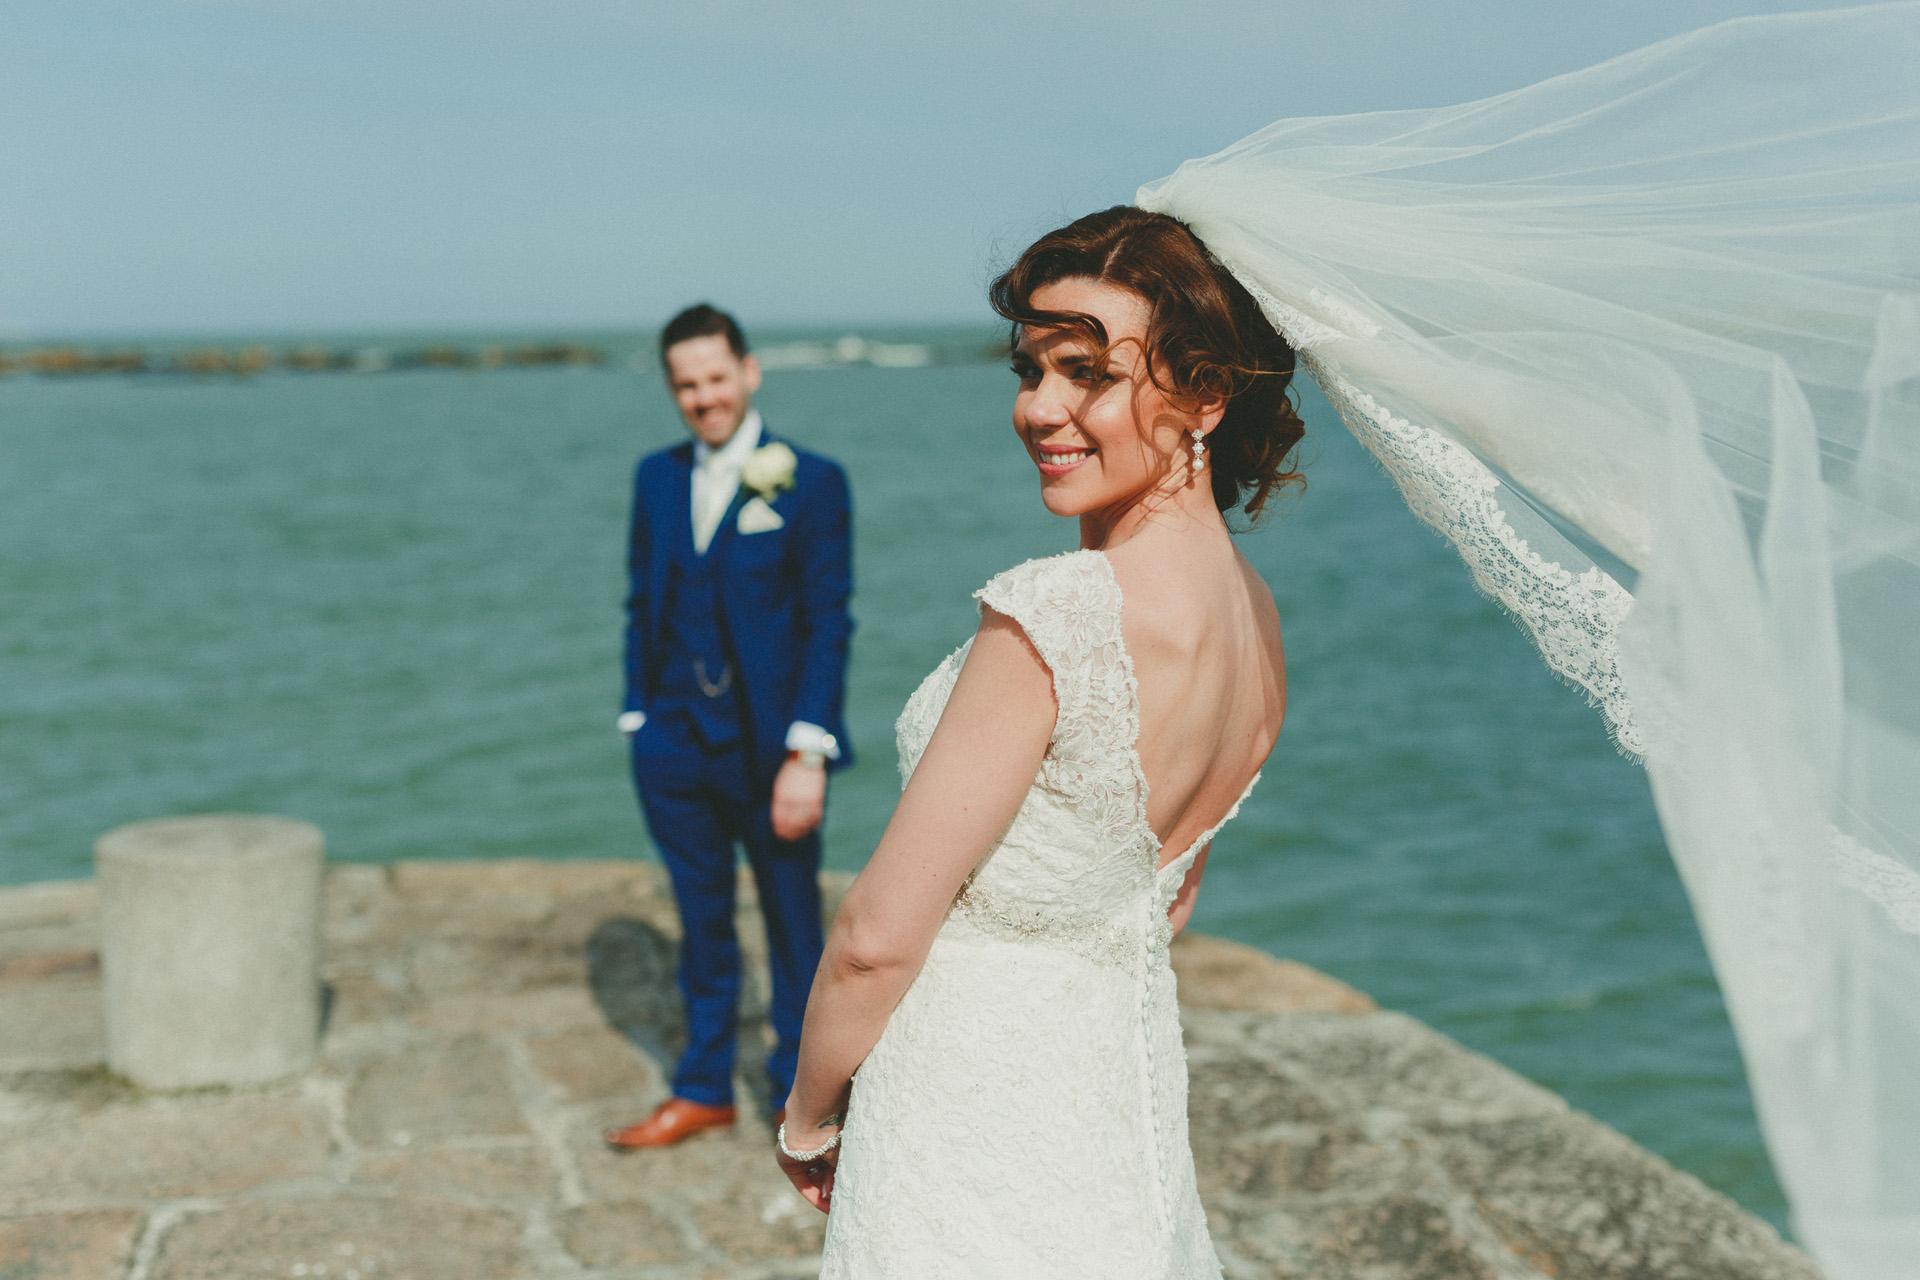 Royal-marine-hotel-wedding-photos7